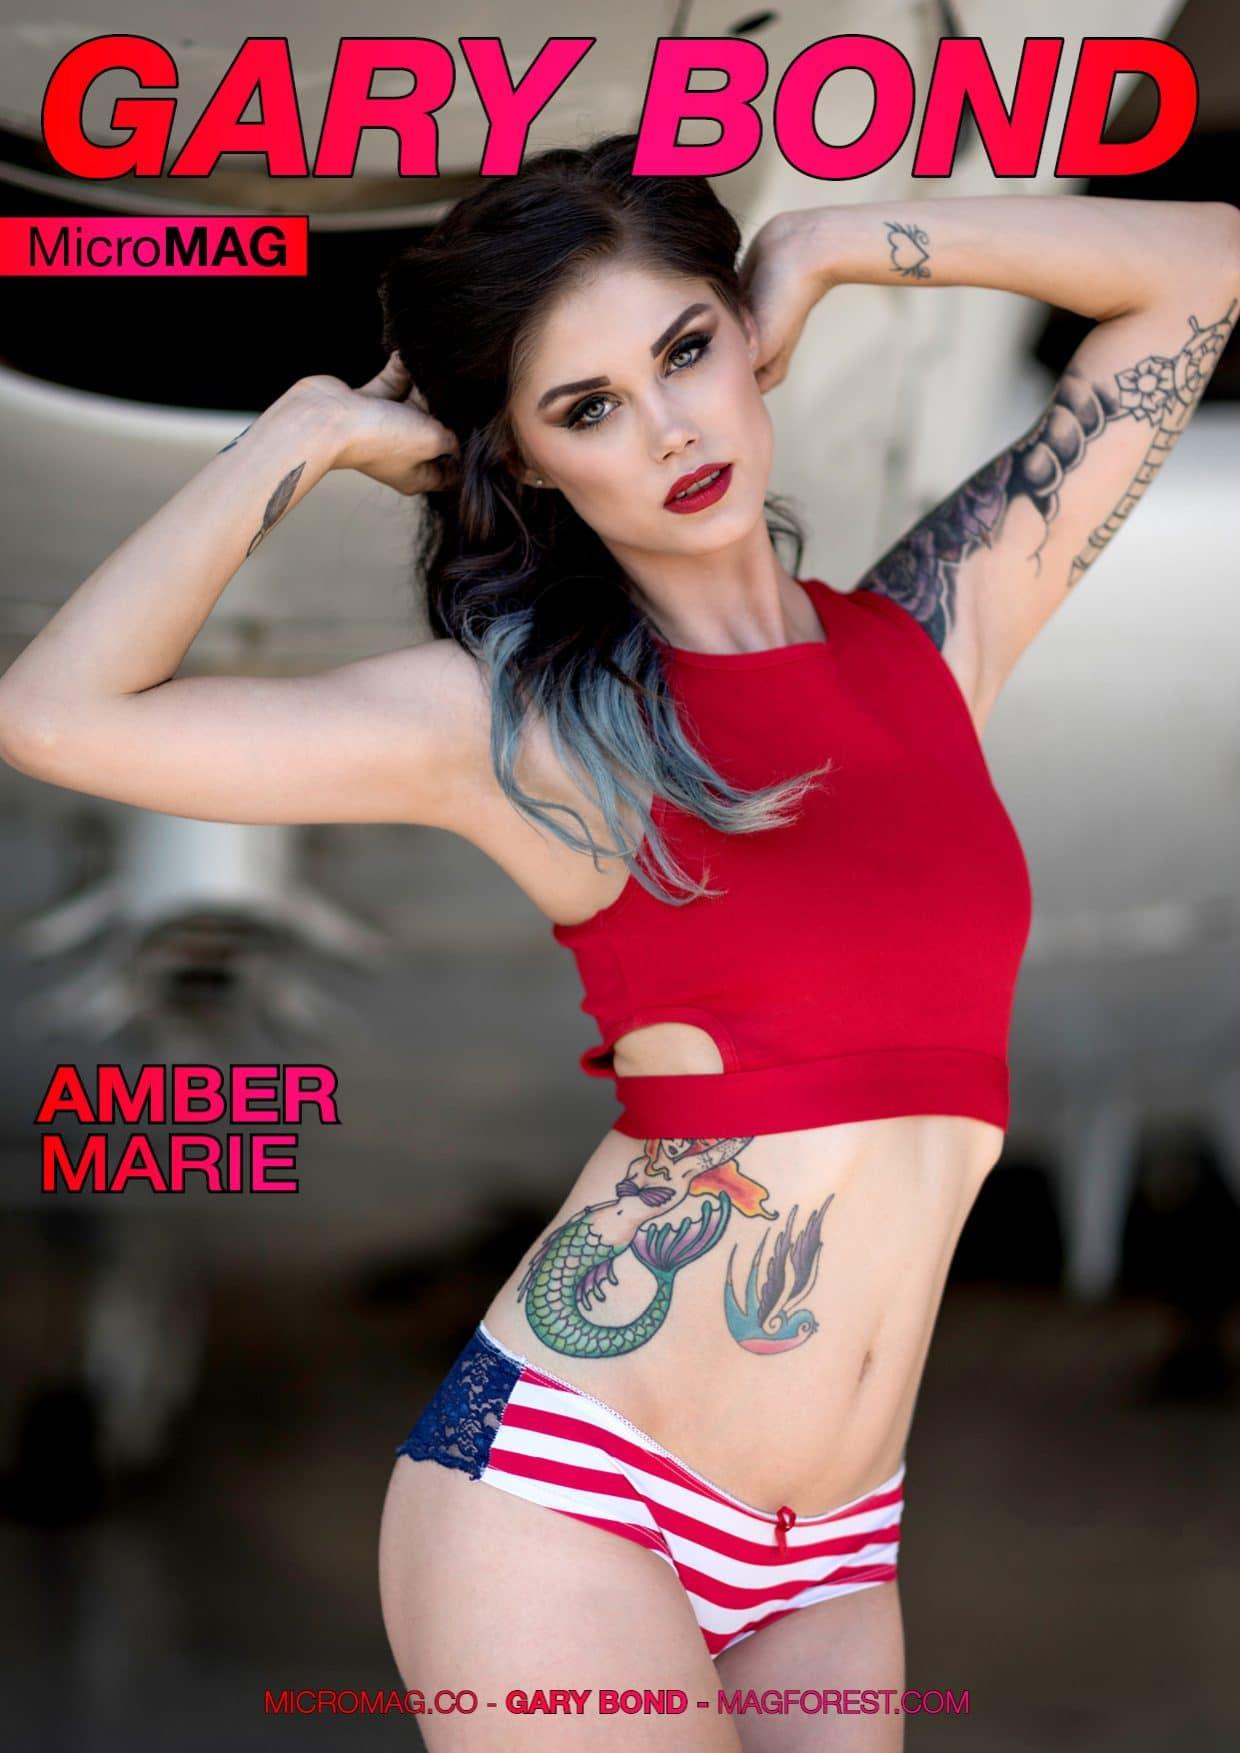 Gary Bond Micromag – Amber Marie